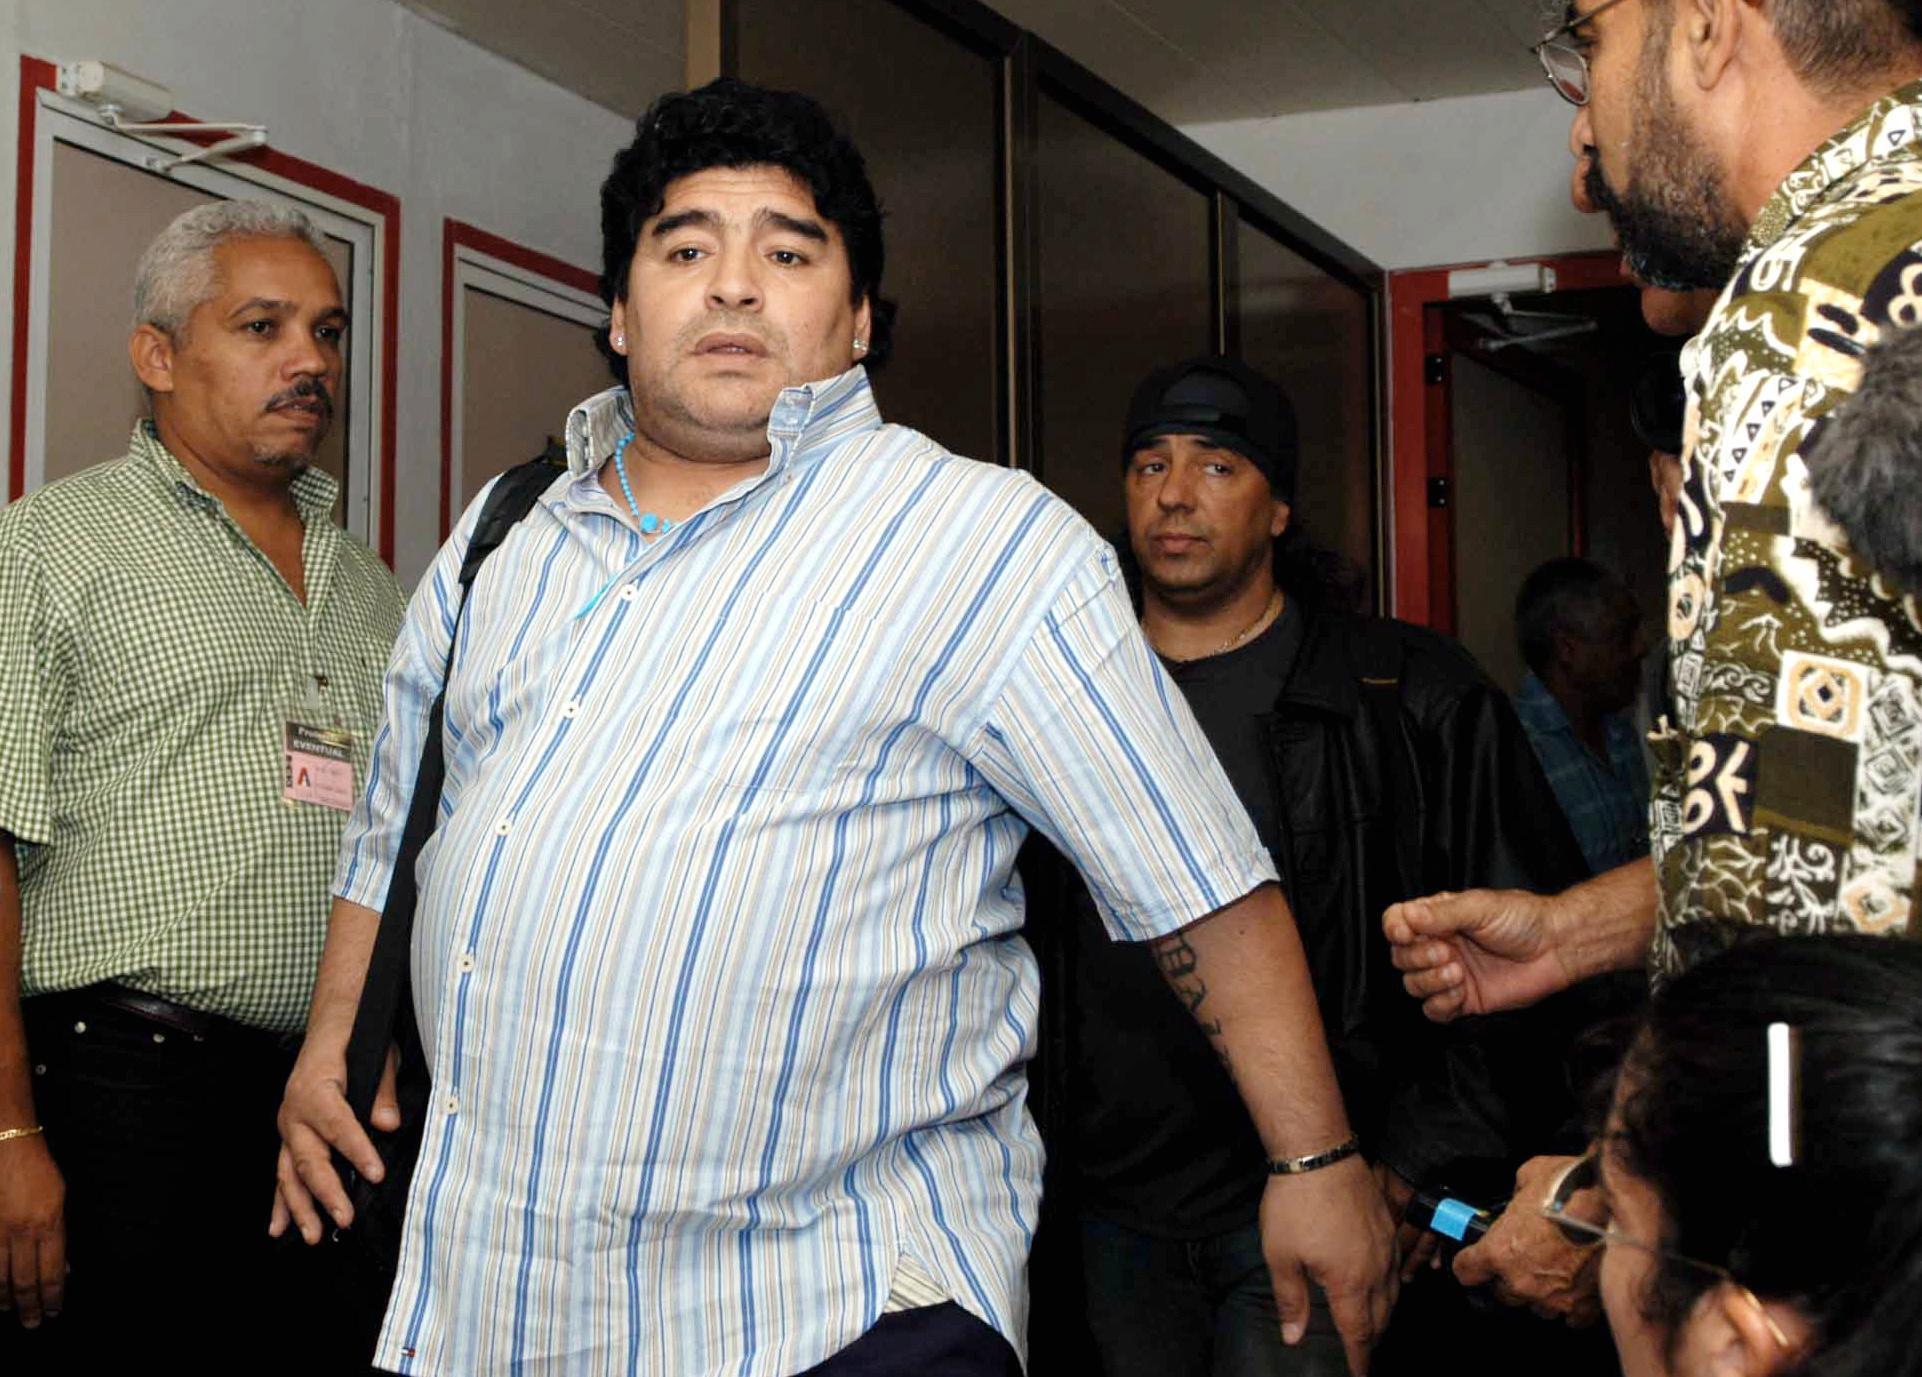 Bild zu Diego Maradona, Havana, Kuba, Flughafen, Ankunft, Jose Marti